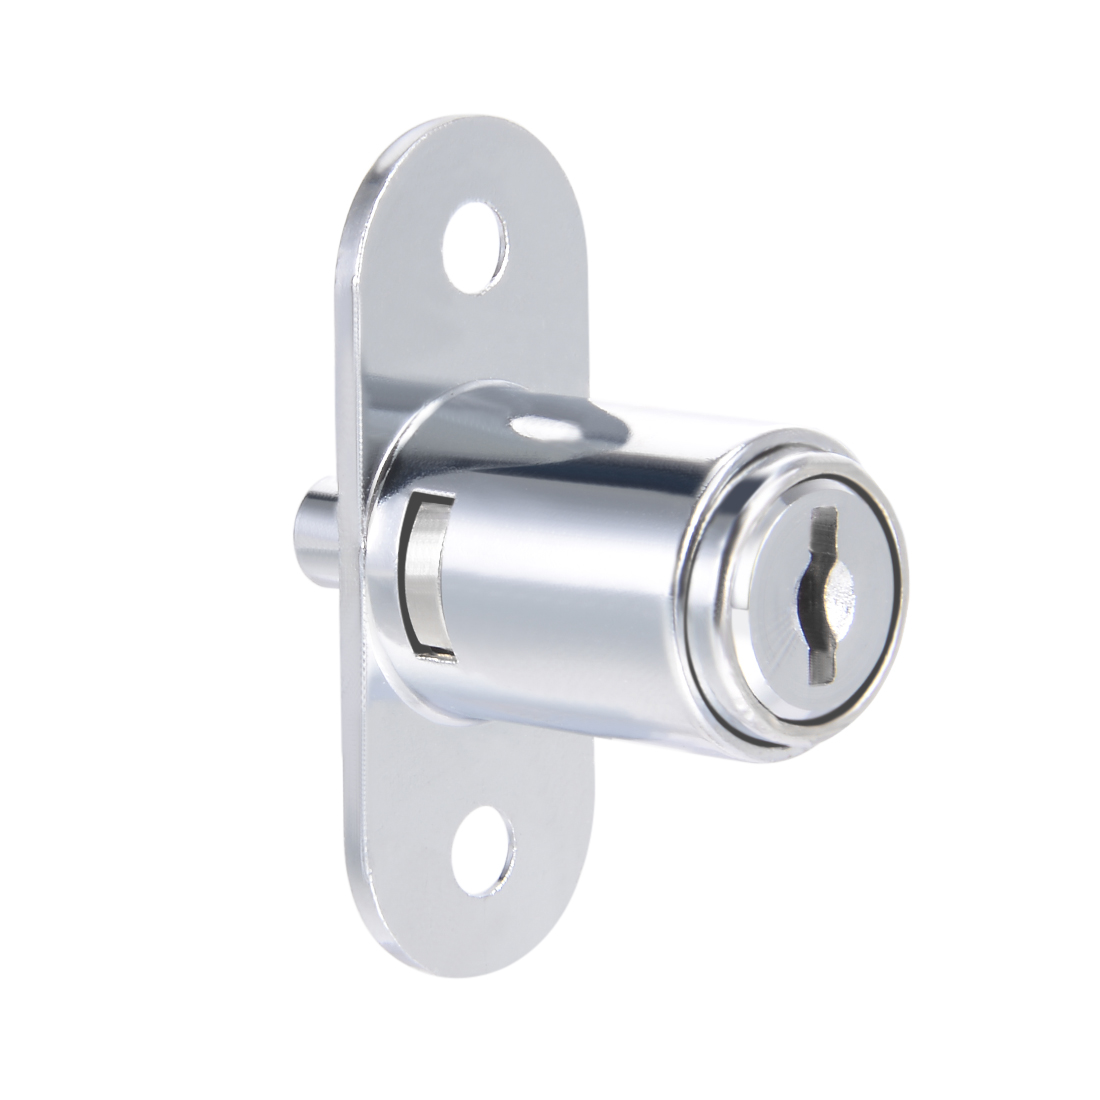 23mmx19mm Cylinder Zinc Alloy Chrome Finish Plunger Lock, Keyed Different